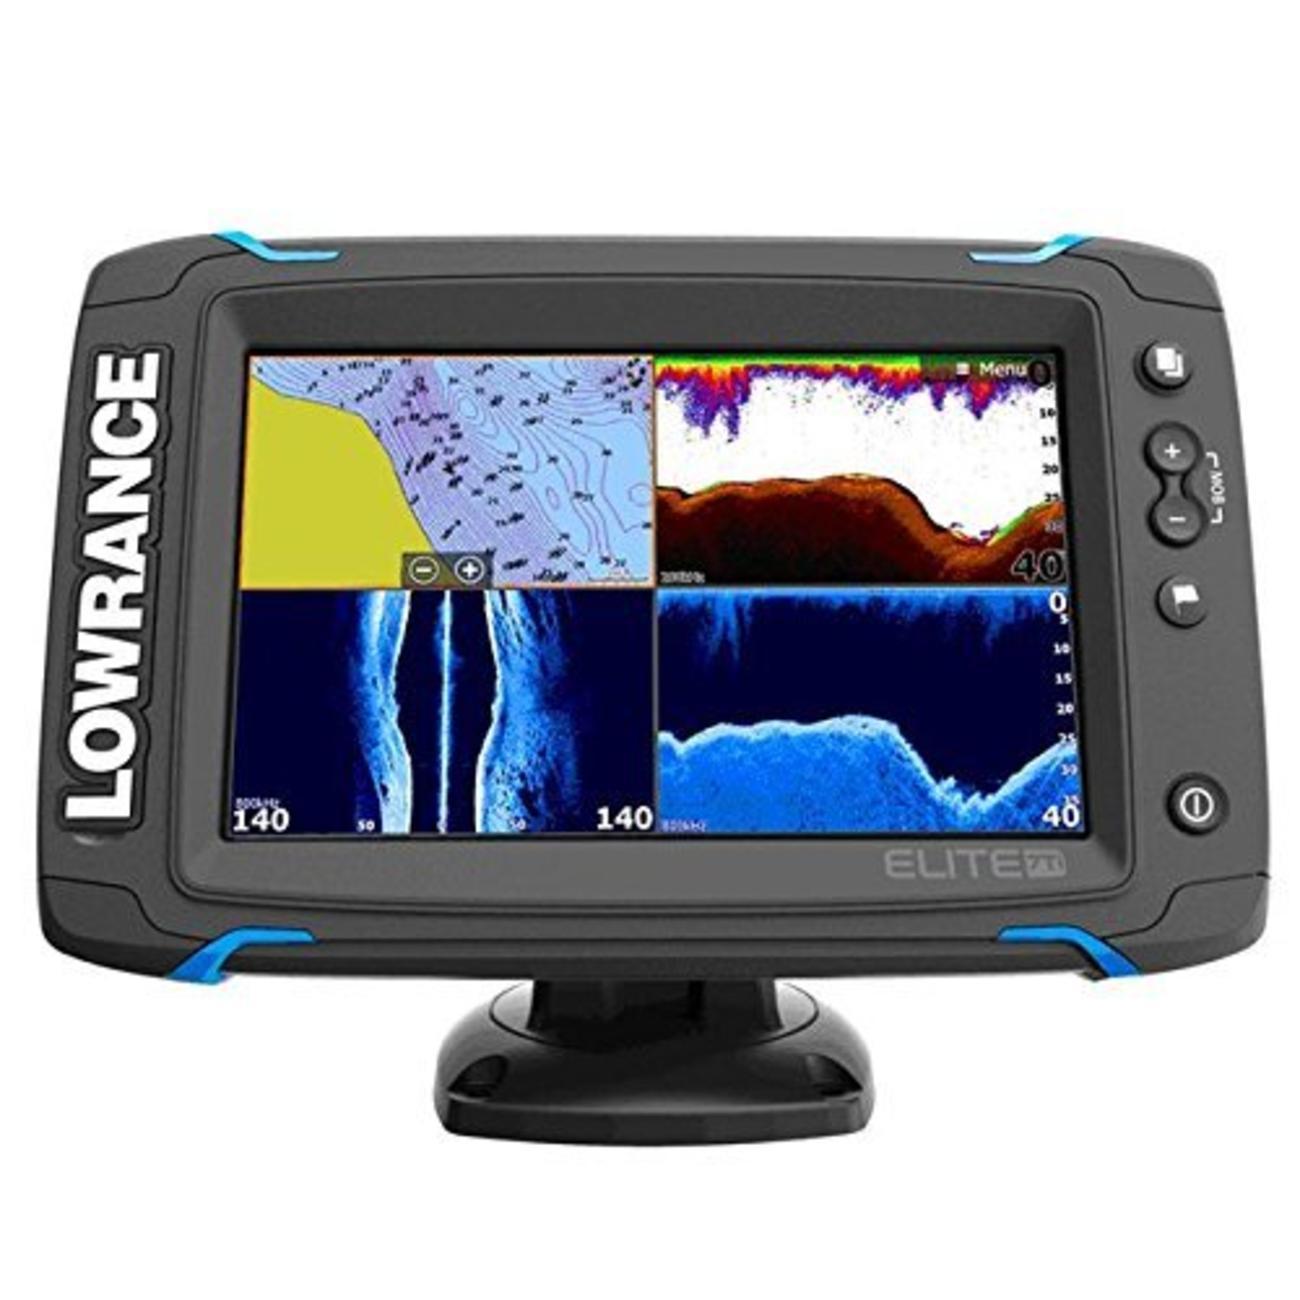 LOWRANCE(ローランス) Elite-7Ti 深場用振動子付 全国湖沼図AT5付き 魚群探知機